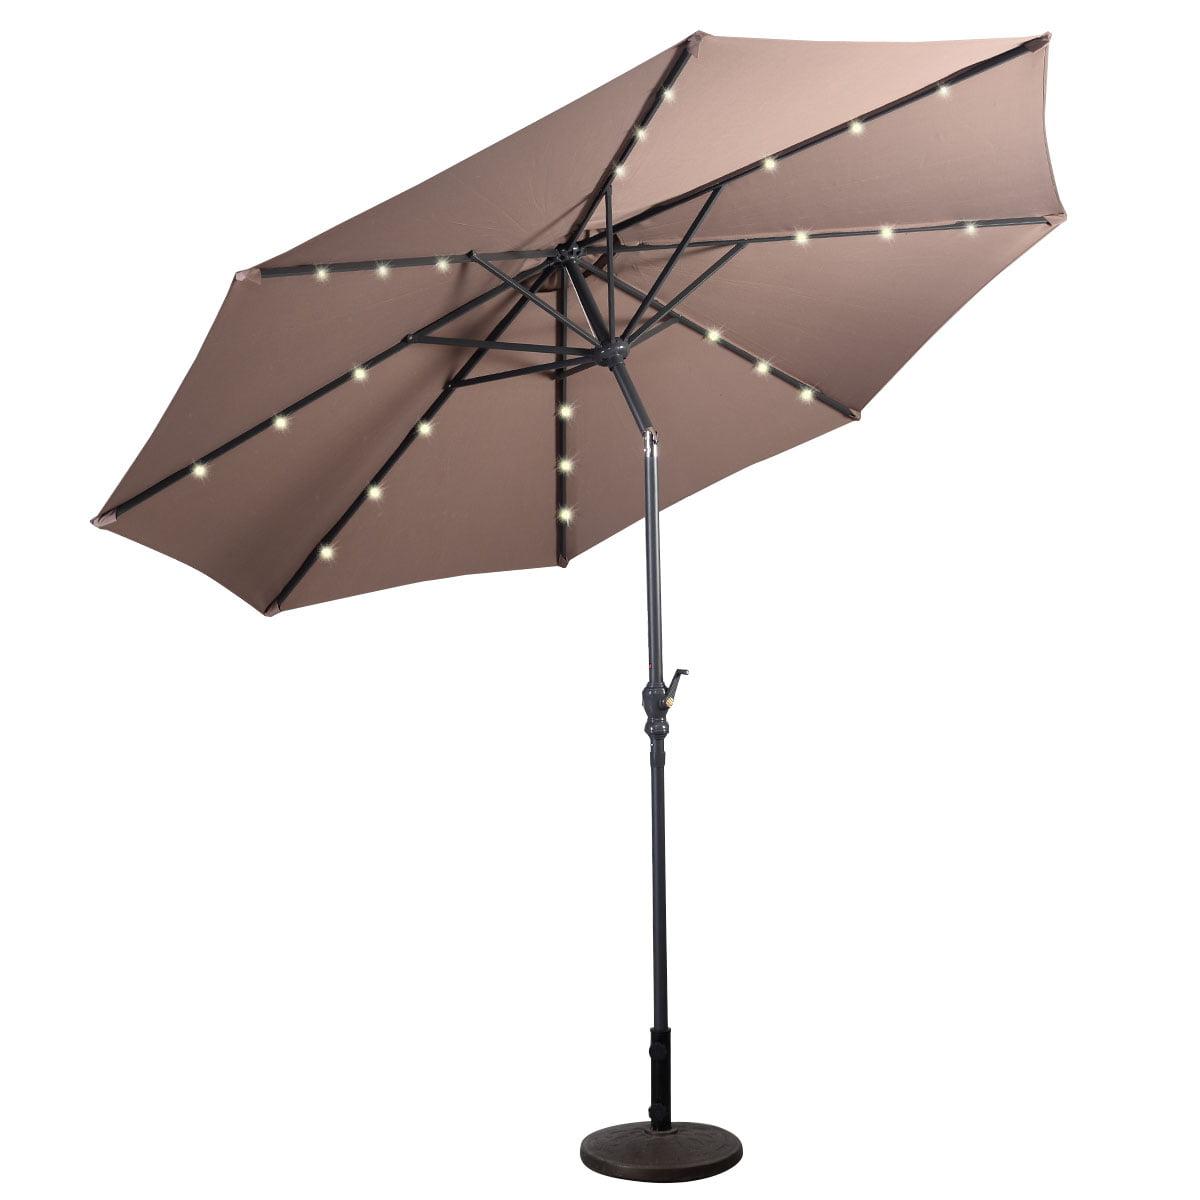 Costway 10ft Patio Solar Umbrella LED Patio Market Steel Tilt w  Crank Outdoor (Tan) by Costway